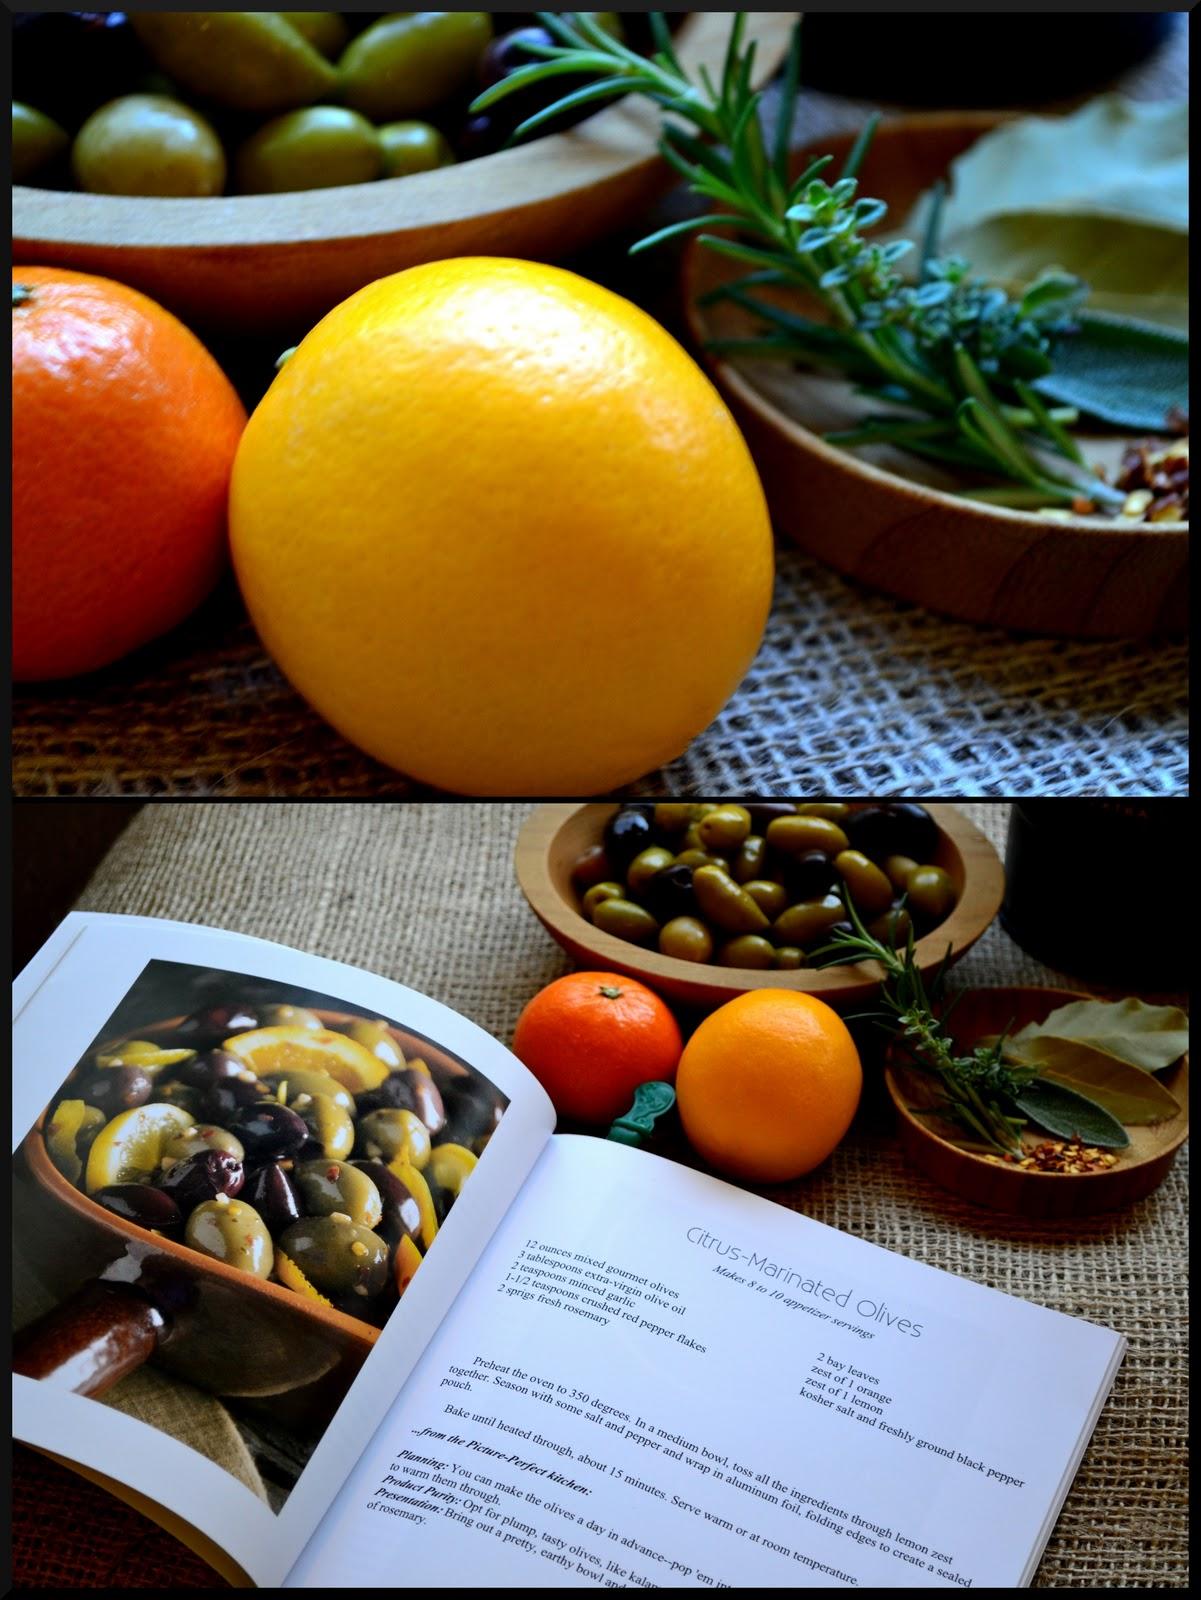 Meyer+Lemon+and+Clementine+Citrus+Marinated+Olives-sm.jpg